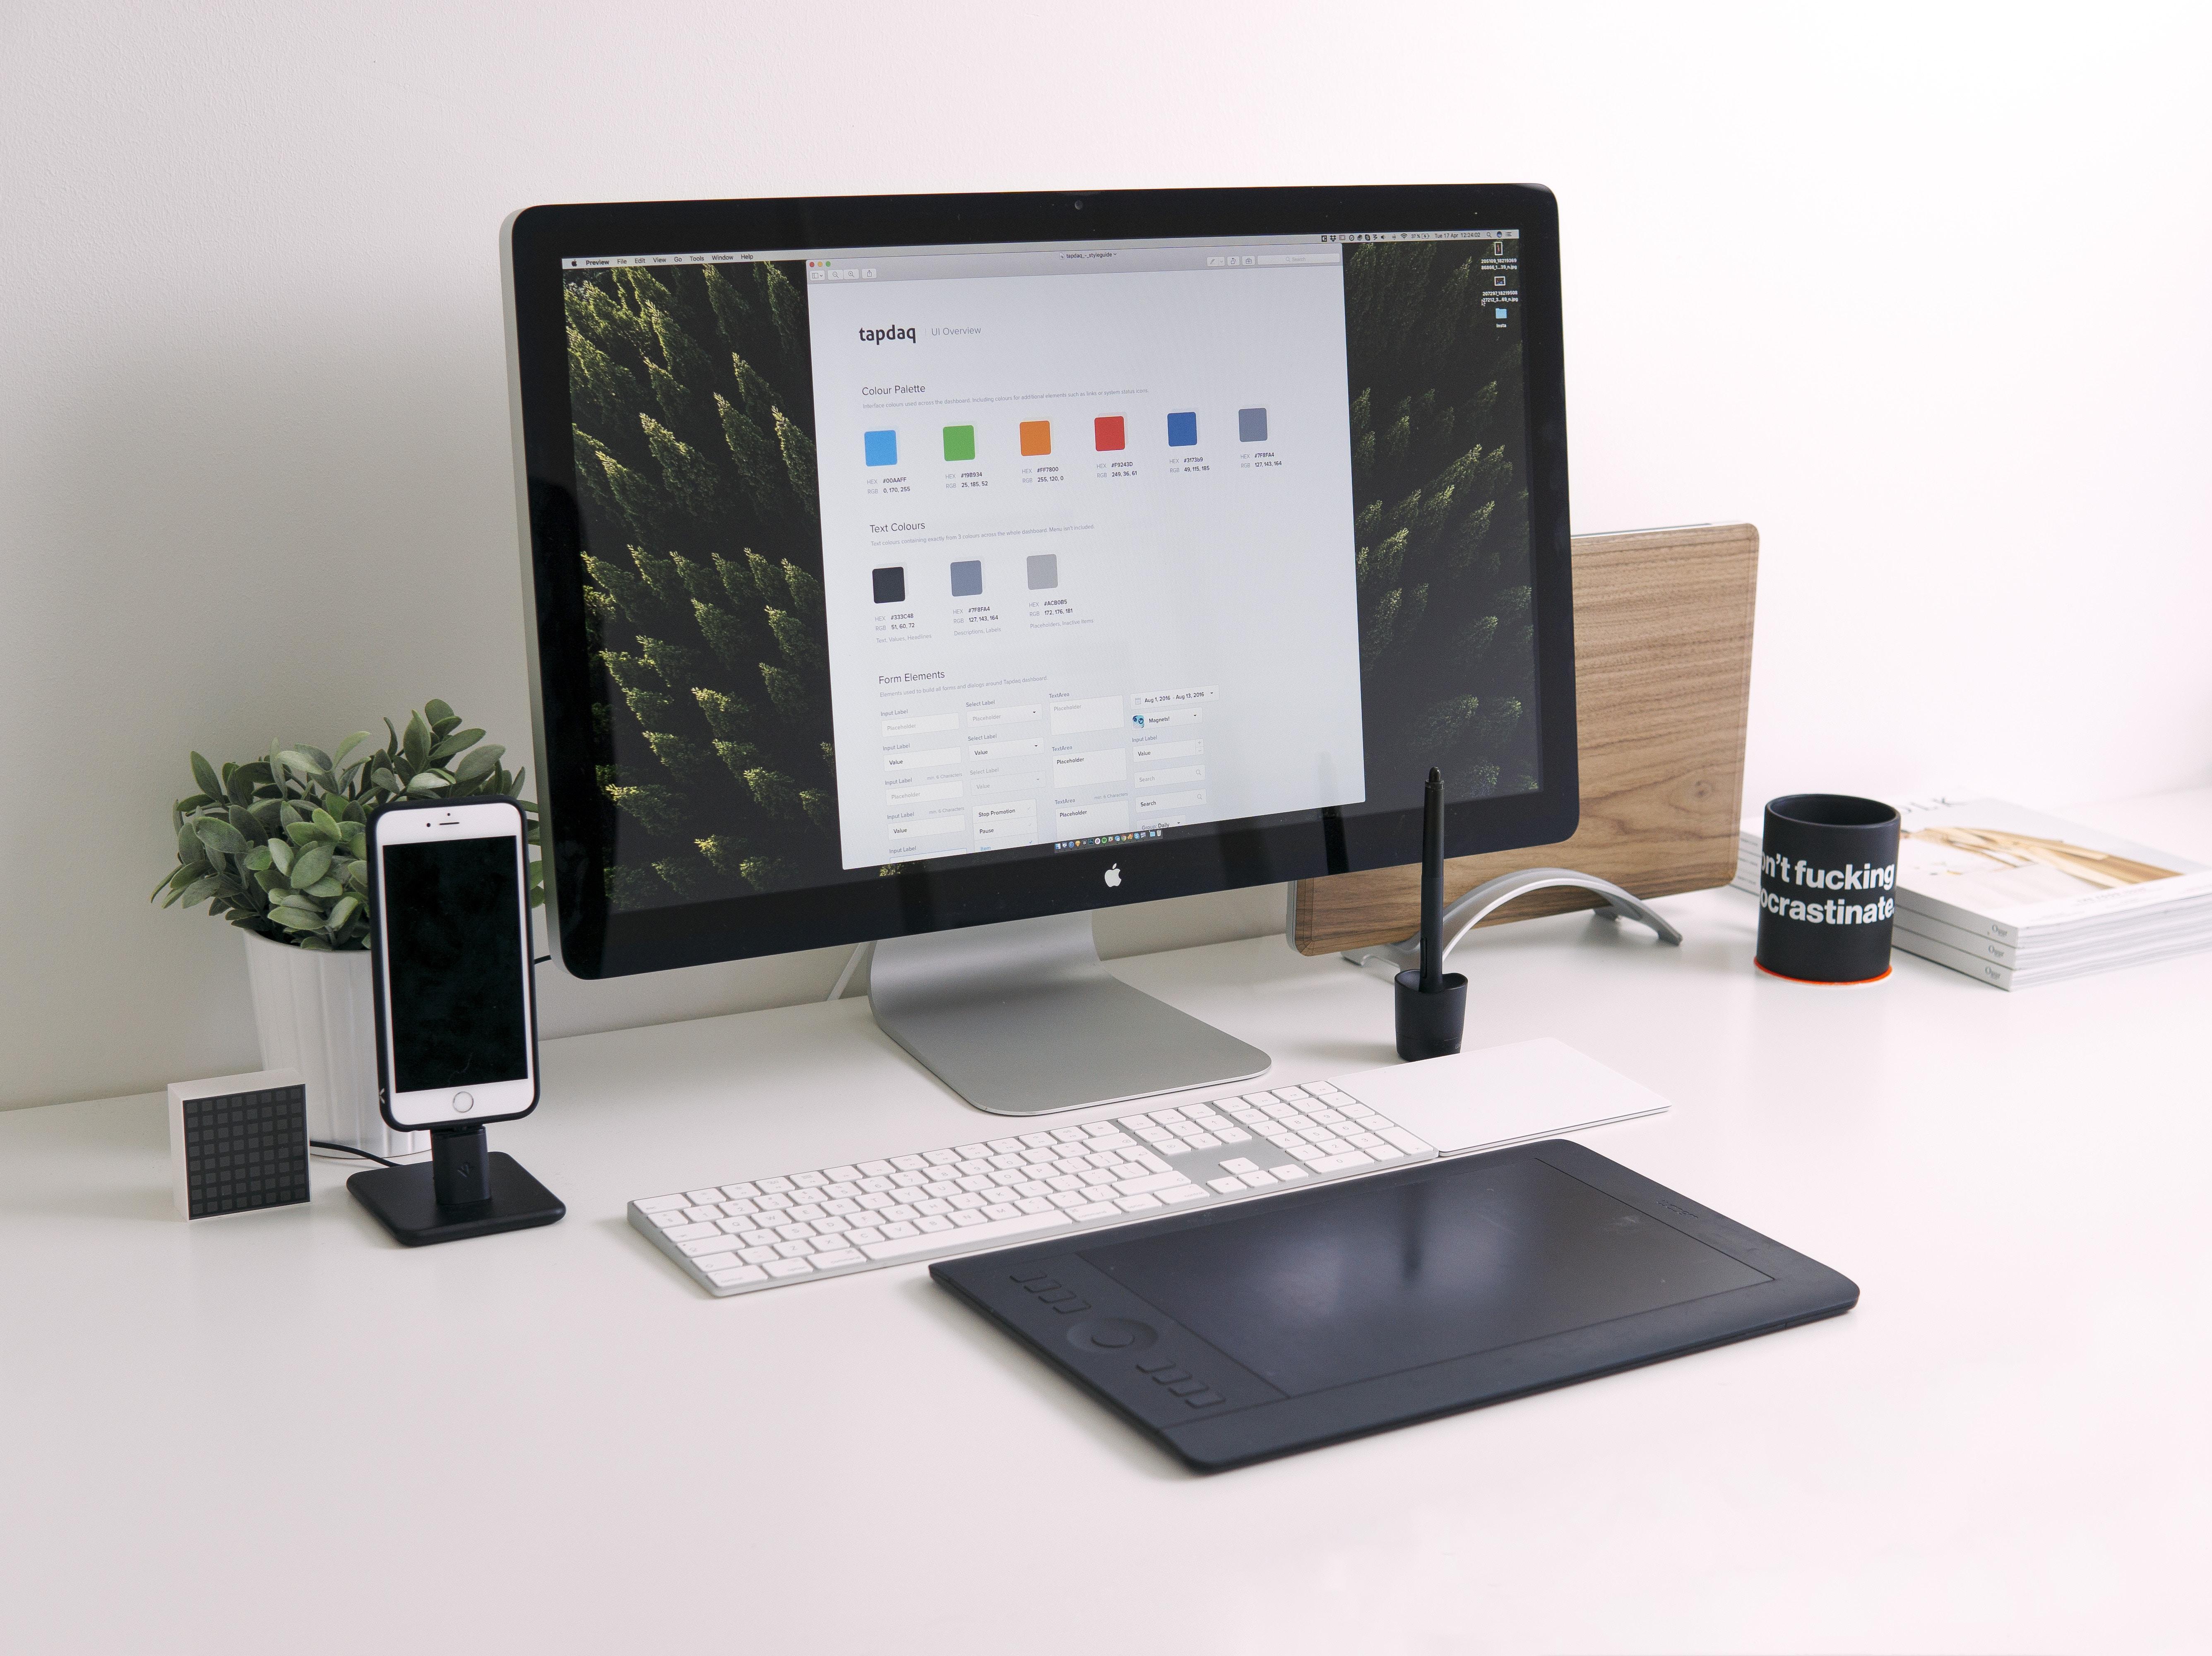 closeup photo of Thunder iMac, Keyboard, and trackpad on white desk